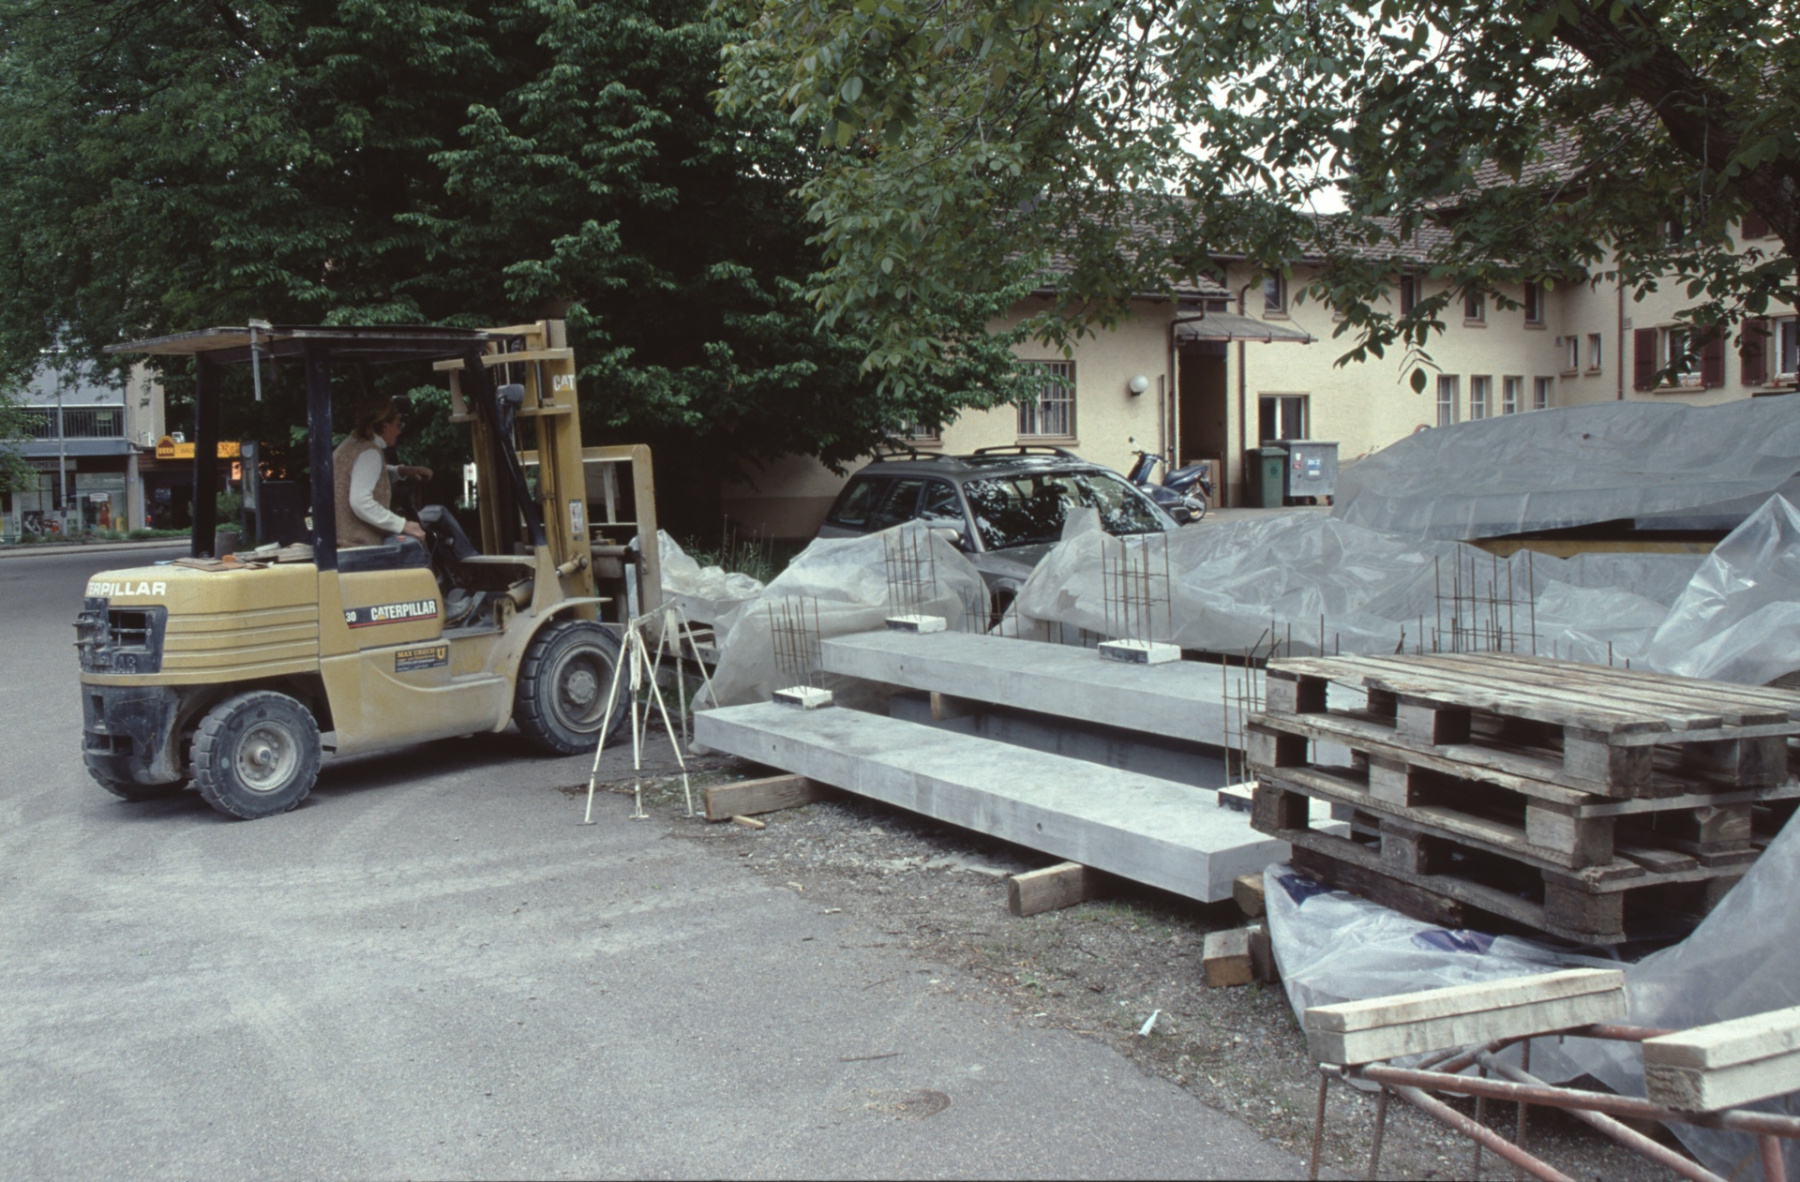 Friedhofstr 1, Beton Elemente Boito. Frau Boito (mit Gabelstappler)